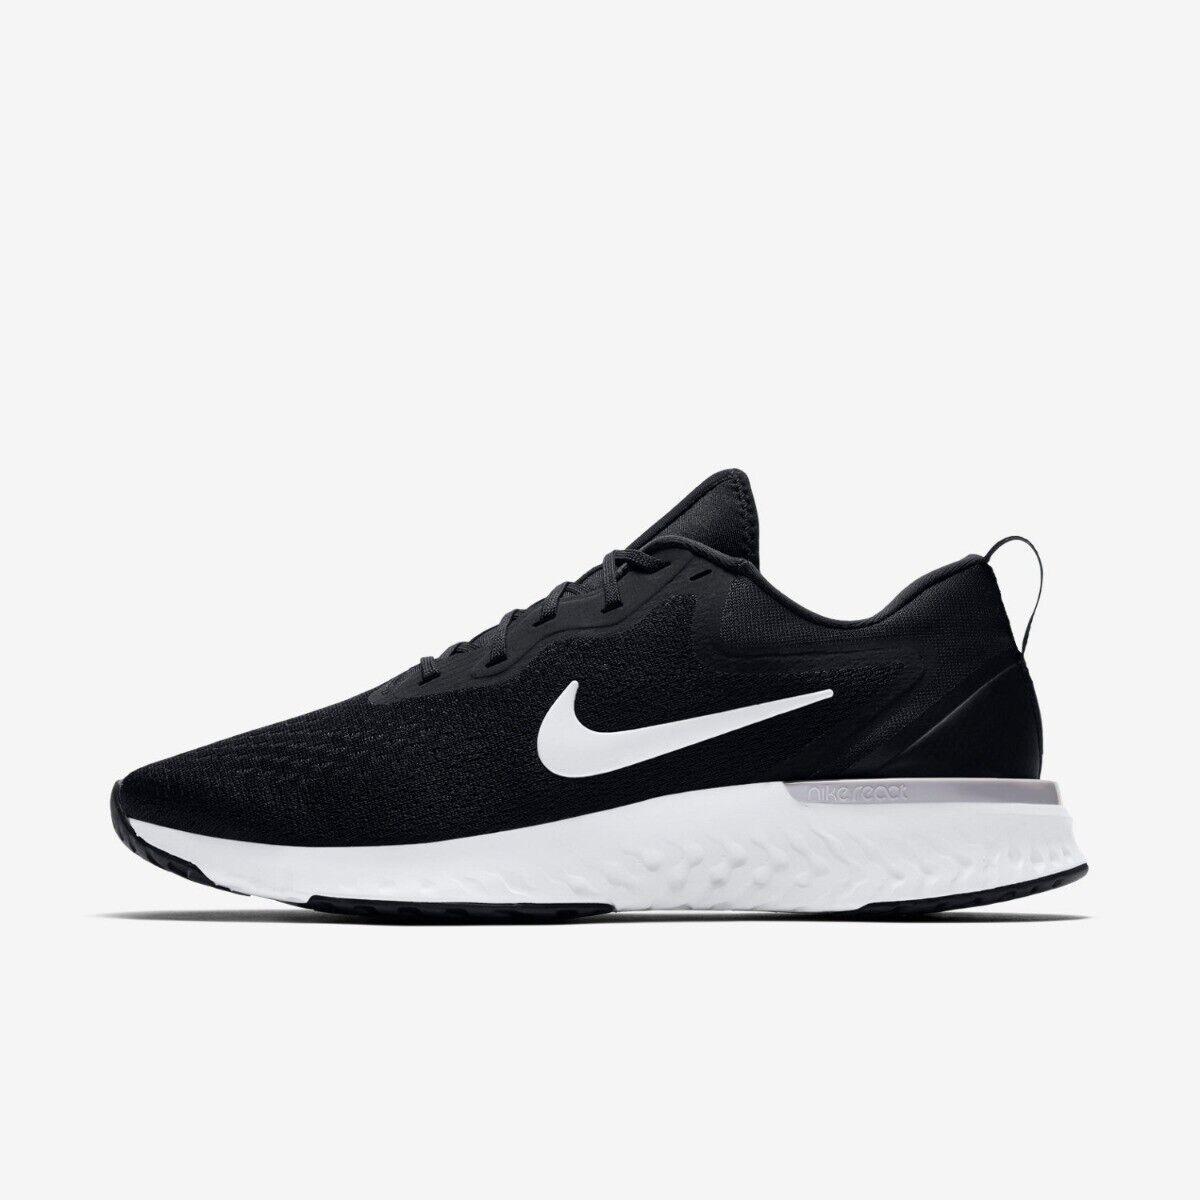 Nike Odyssey React Mens Trainer shoe Size 9 9.5 10 12 Black White Greys